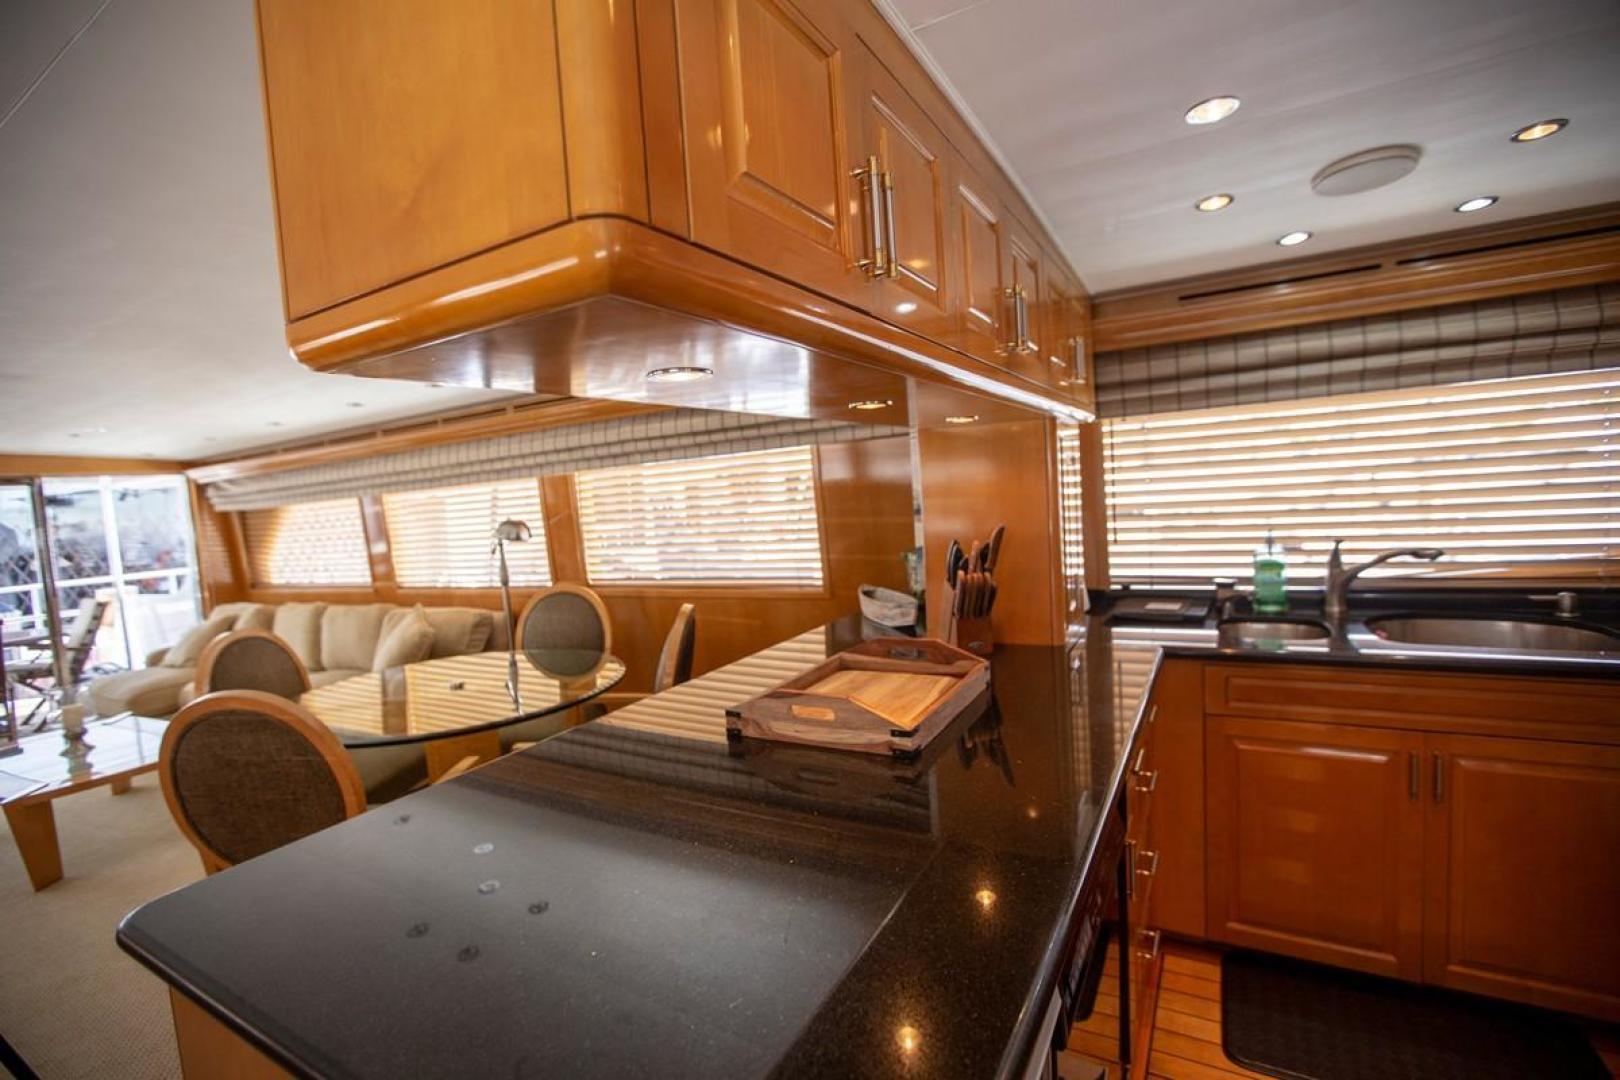 Hatteras-Cockpit Motor Yacht 2000-Getaway Ft. Lauderdale-Florida-United States-977368 | Thumbnail